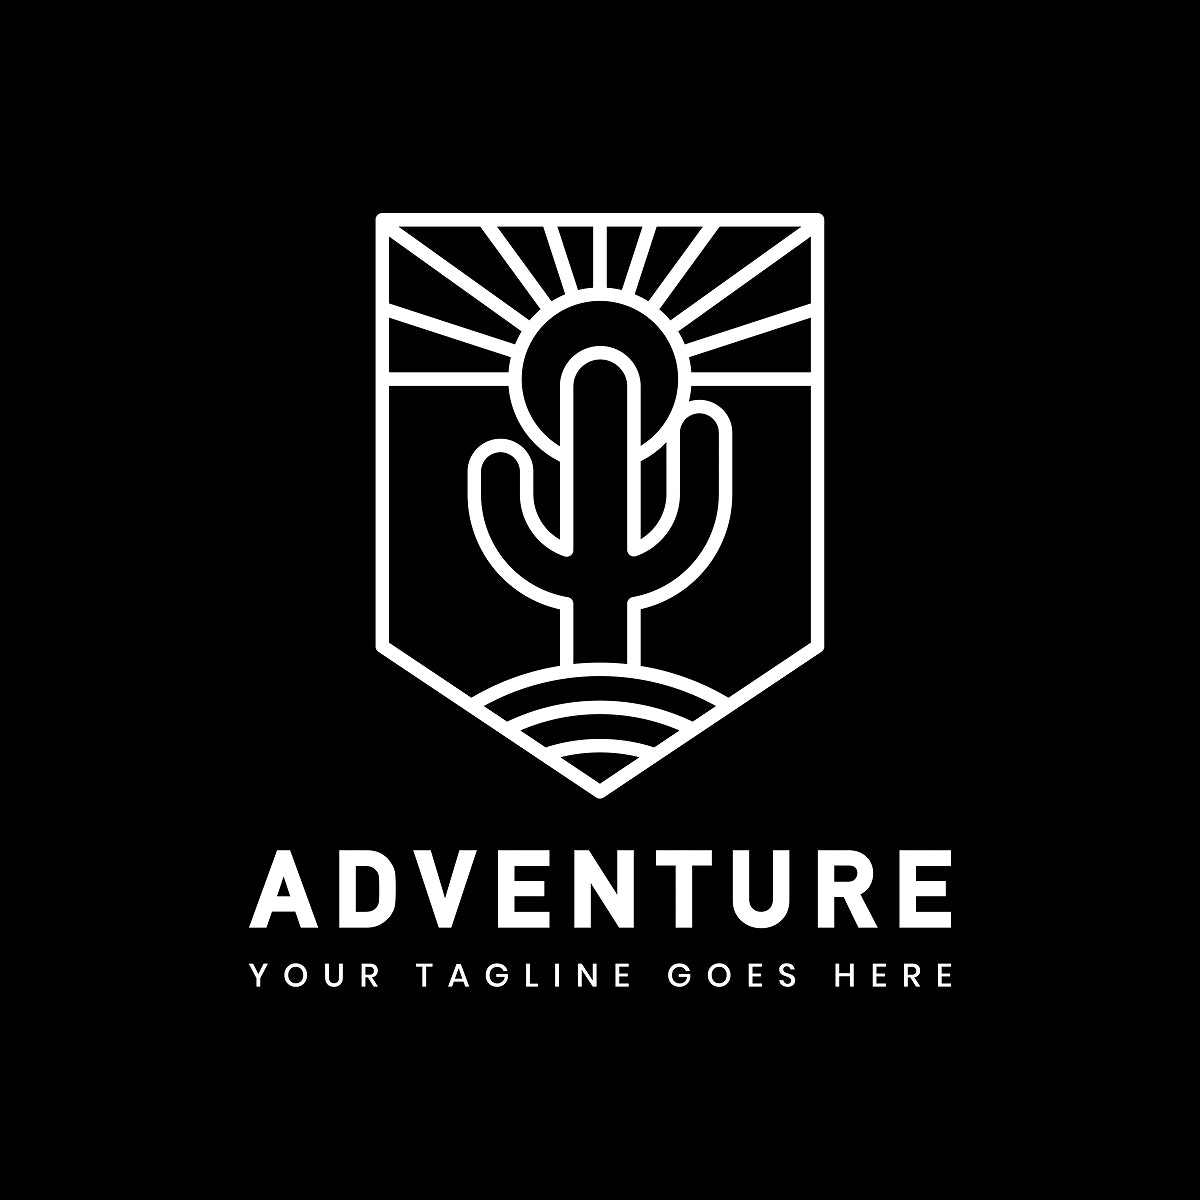 Outdoor adventure logo badge template